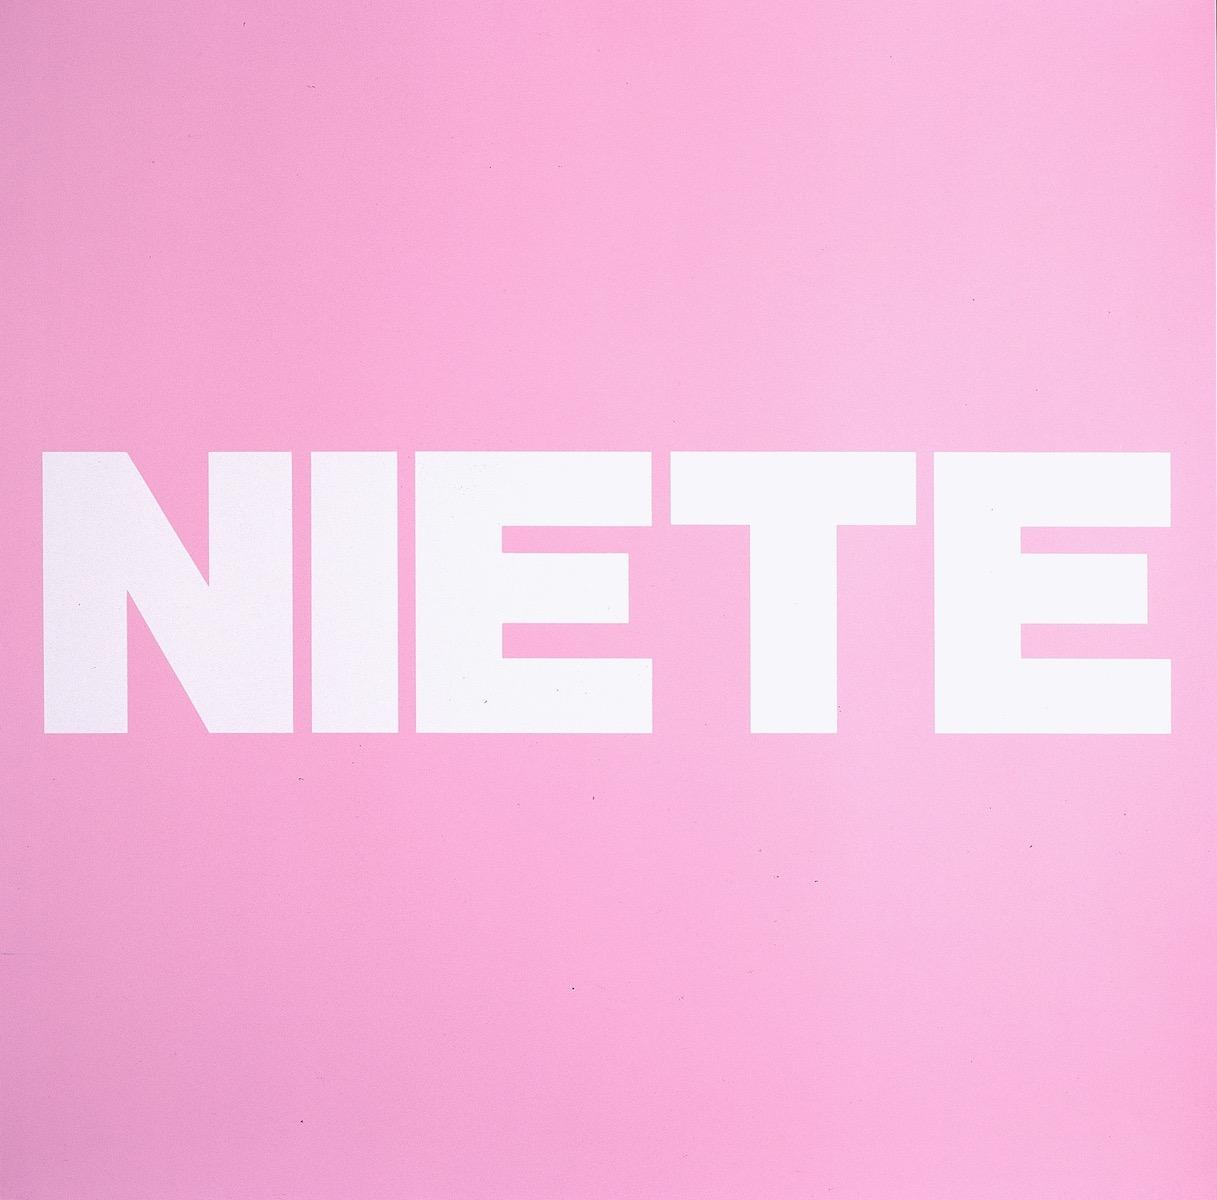 NIETE, ROSA | Affirmation tut gut | Angelika Beuler | 1992